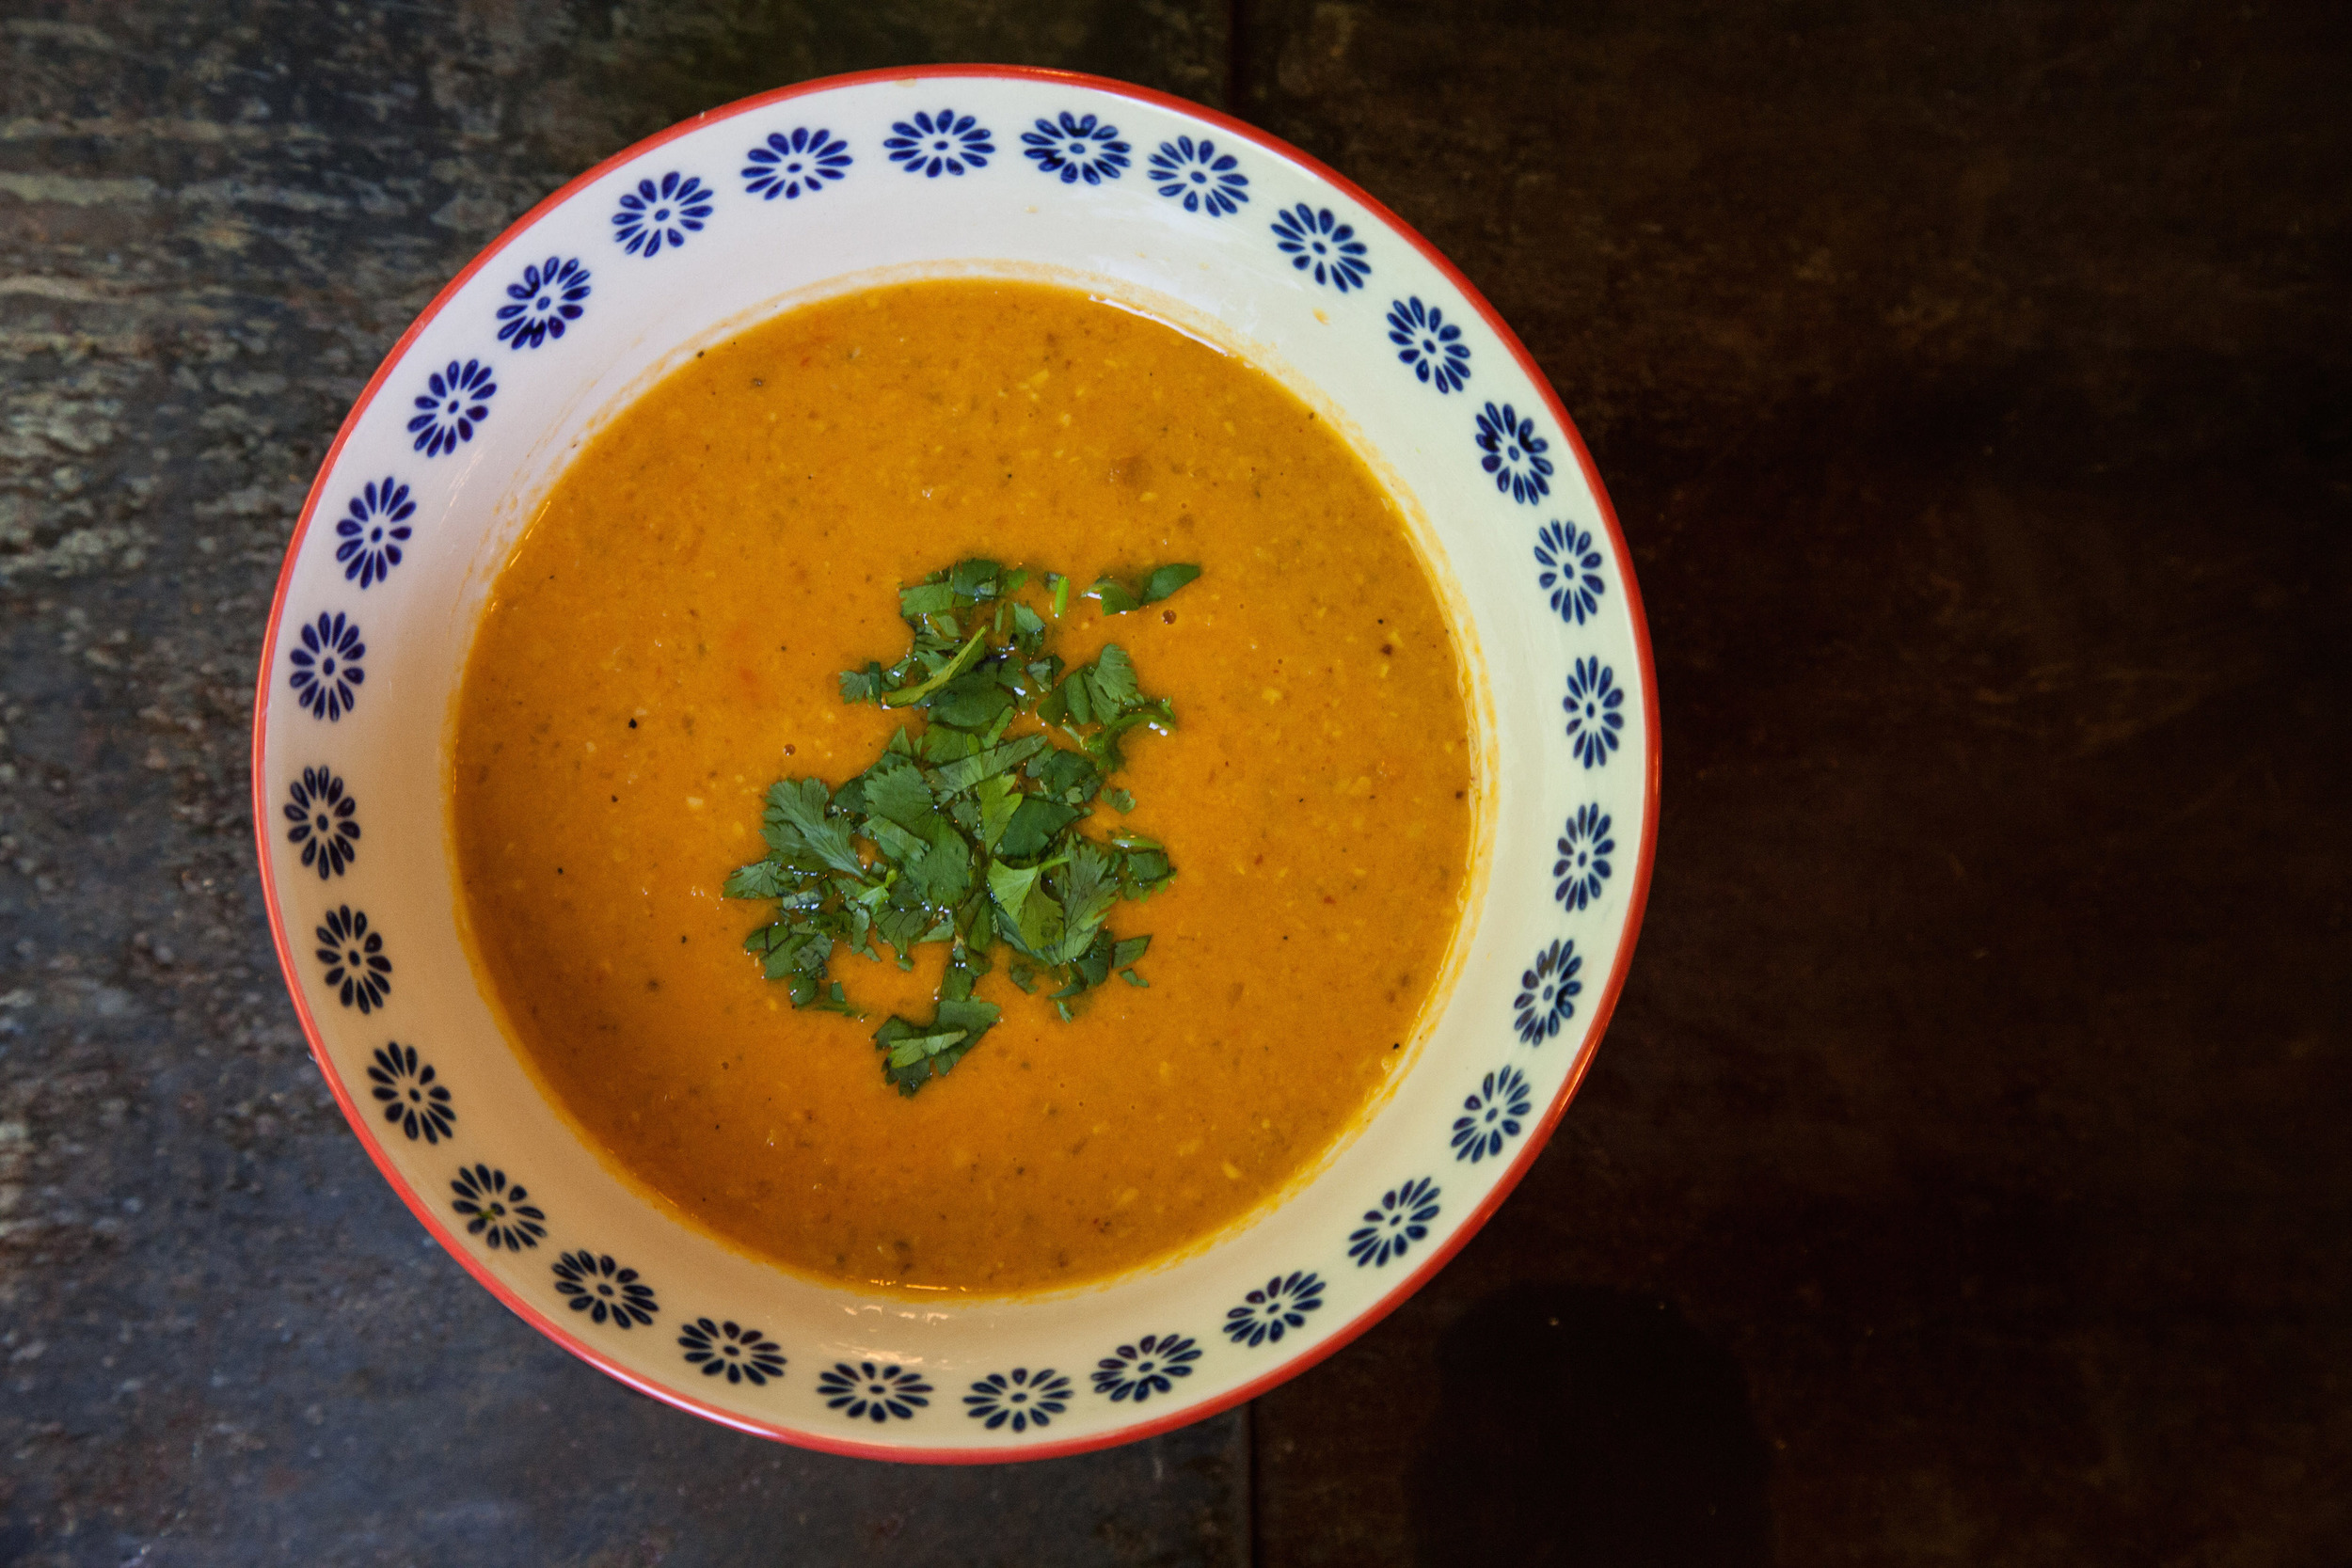 20150716-azafran food (7 of 9) (1).jpg